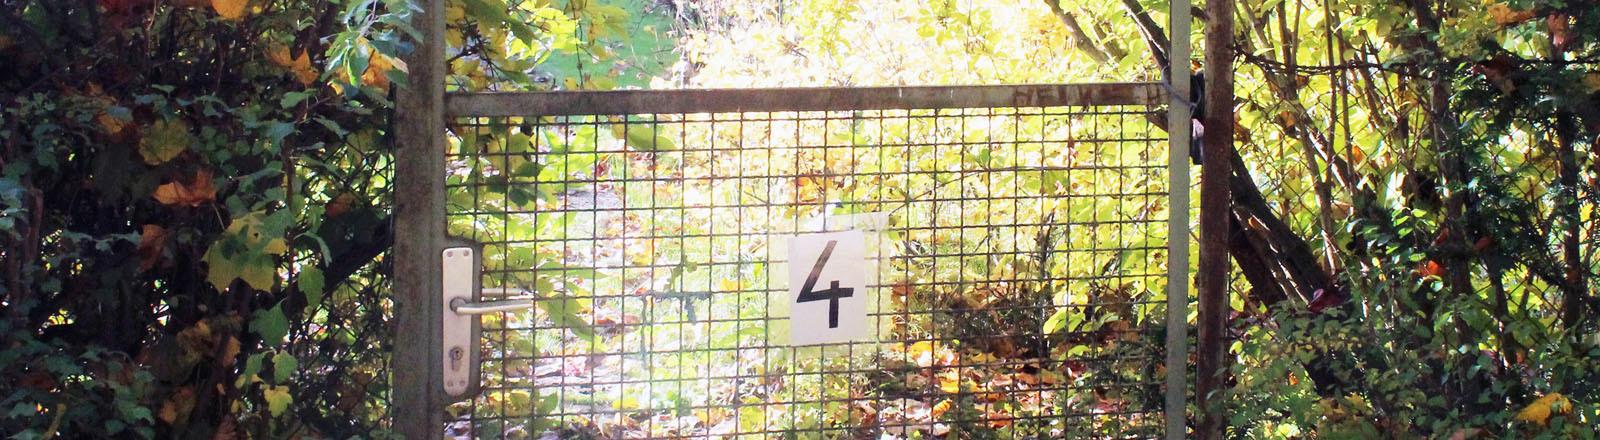 Gartentor Kleingarten